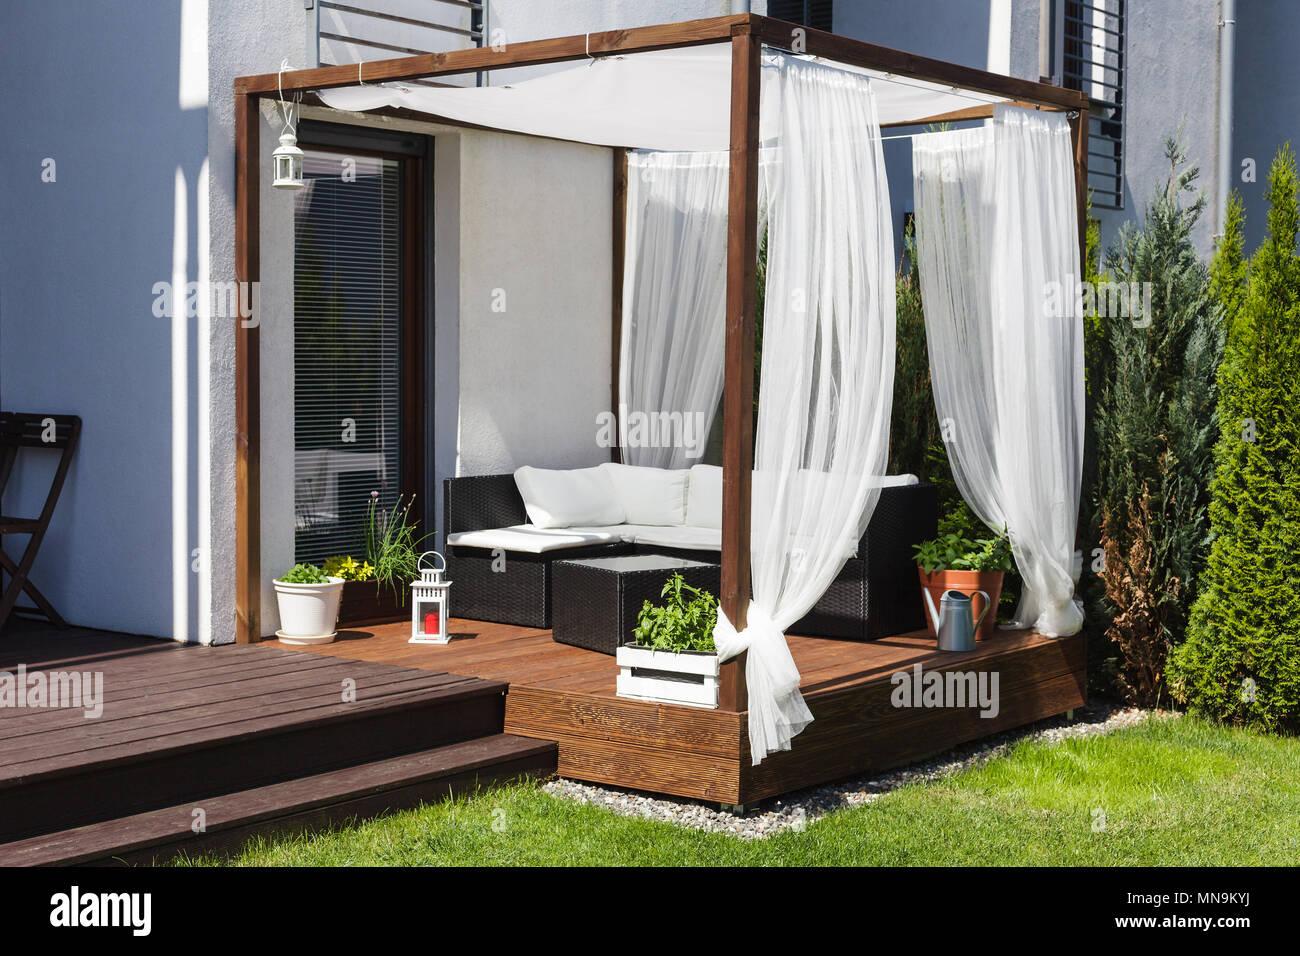 Chillout Lounge En La Terraza De Madera Foto Imagen De